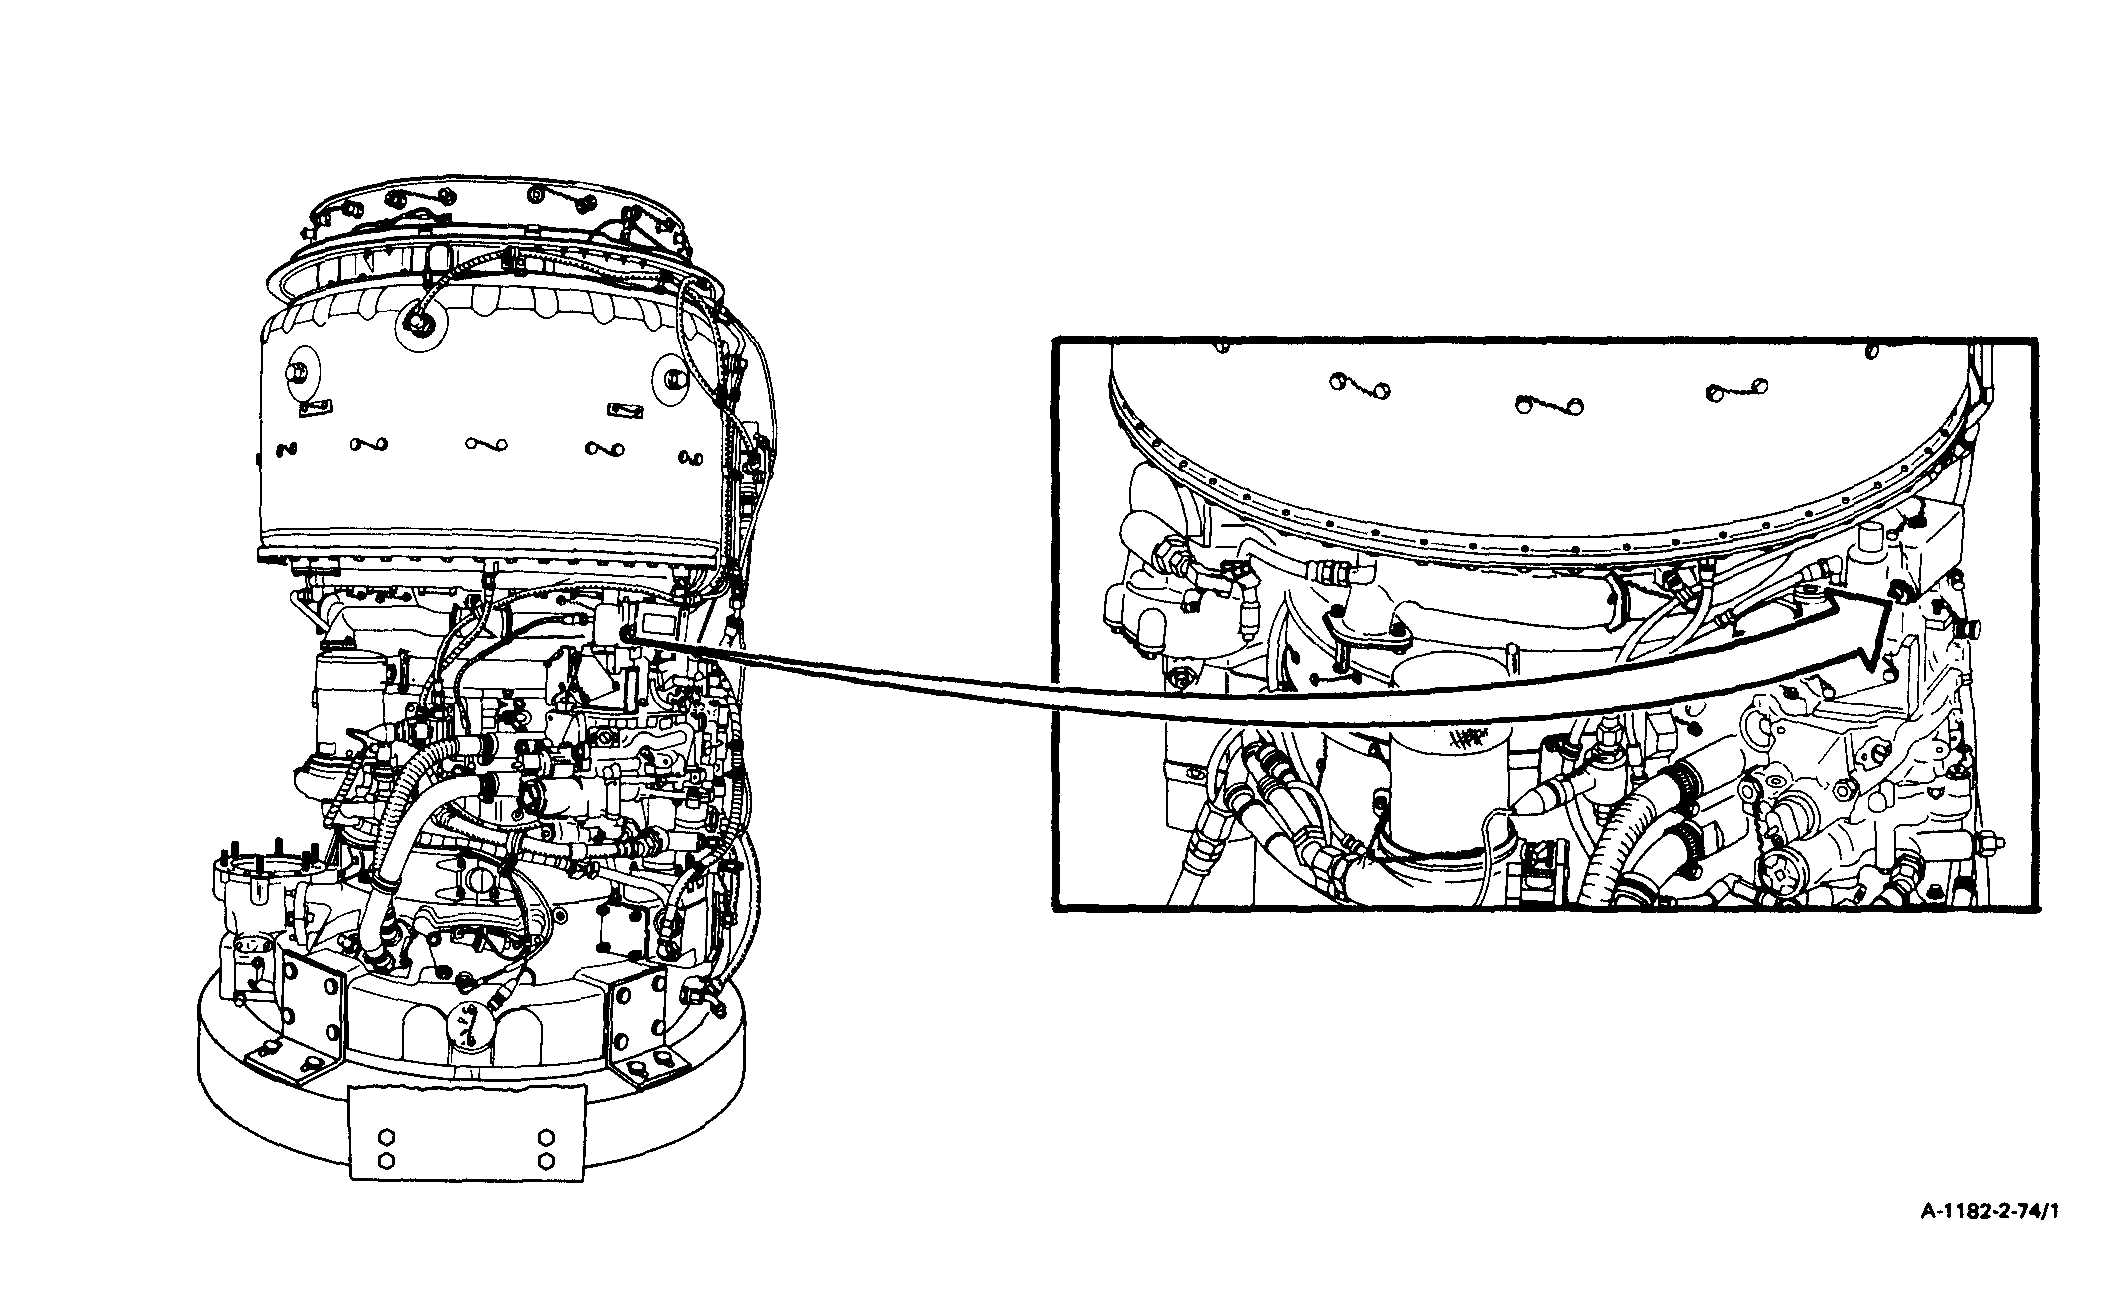 Cessna 340 Wiring Diagram Piper Seneca Wiring Diagram